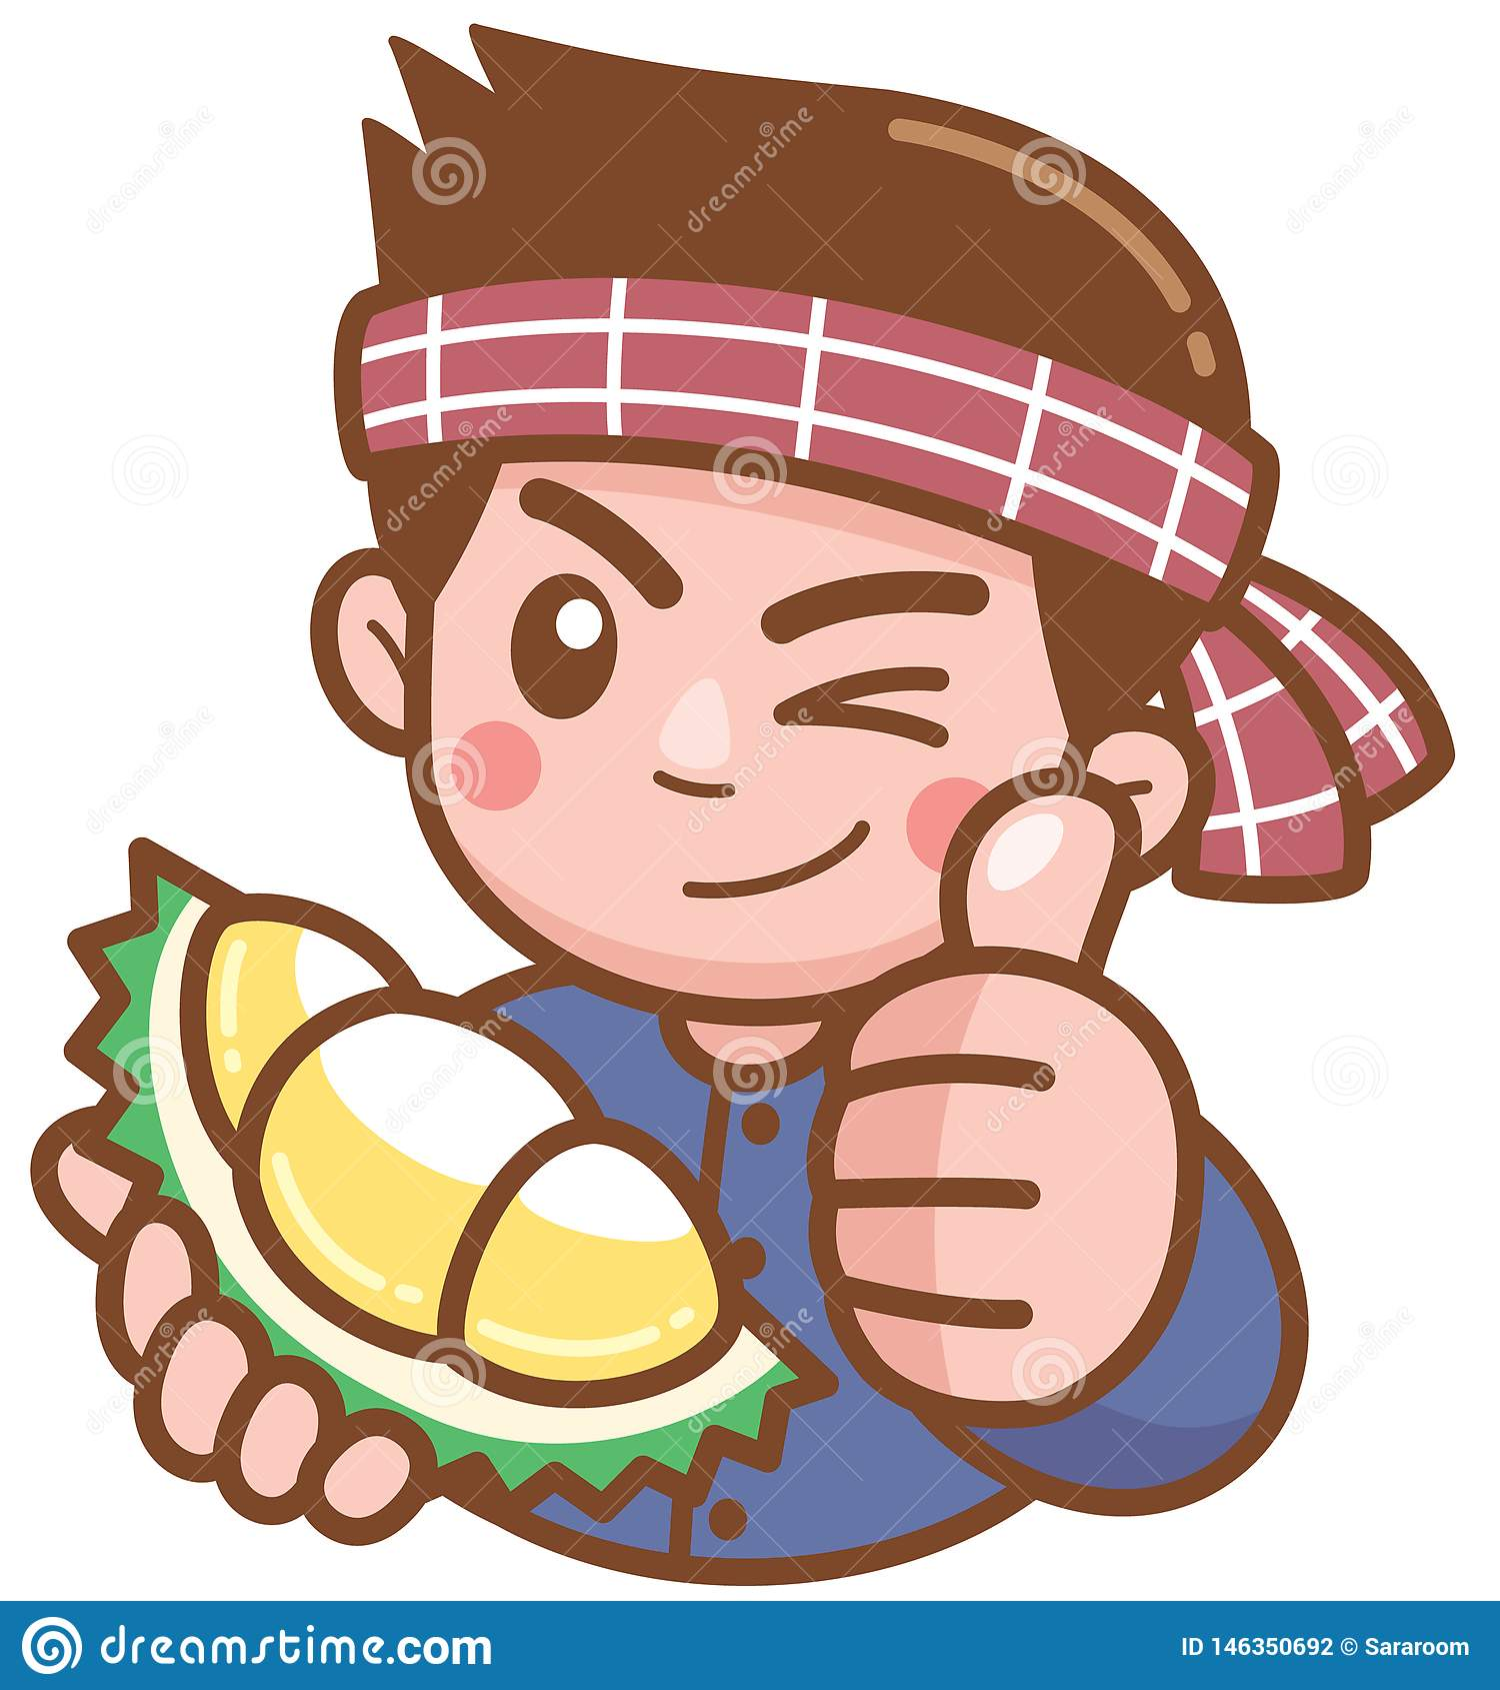 durian seller stock illustrations 7 durian seller stock illustrations vectors clipart dreamstime https www dreamstime com vector illustration cartoon durian seller presenting durian seller image146350692